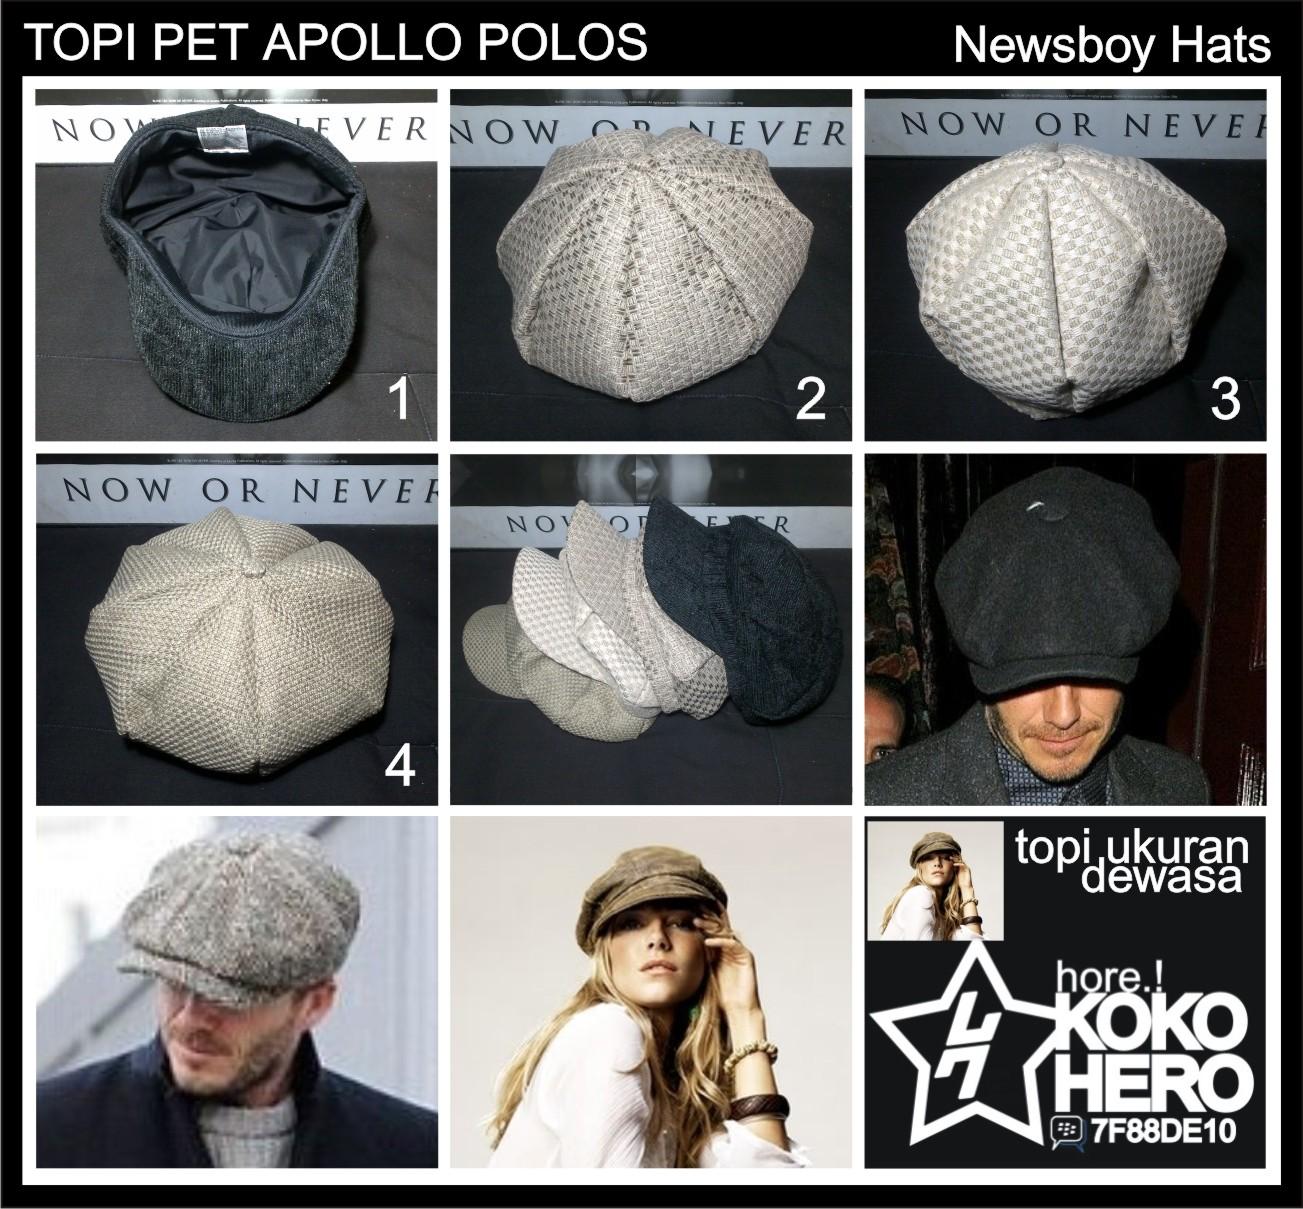 Topi Flat Cap Pet Newsboy Hat Abu Tua Daftar Harga Terlengkap Kalibre Biru Navy 991186 999 Suplayer Paper Boy Topipet Apolo Mario Bros